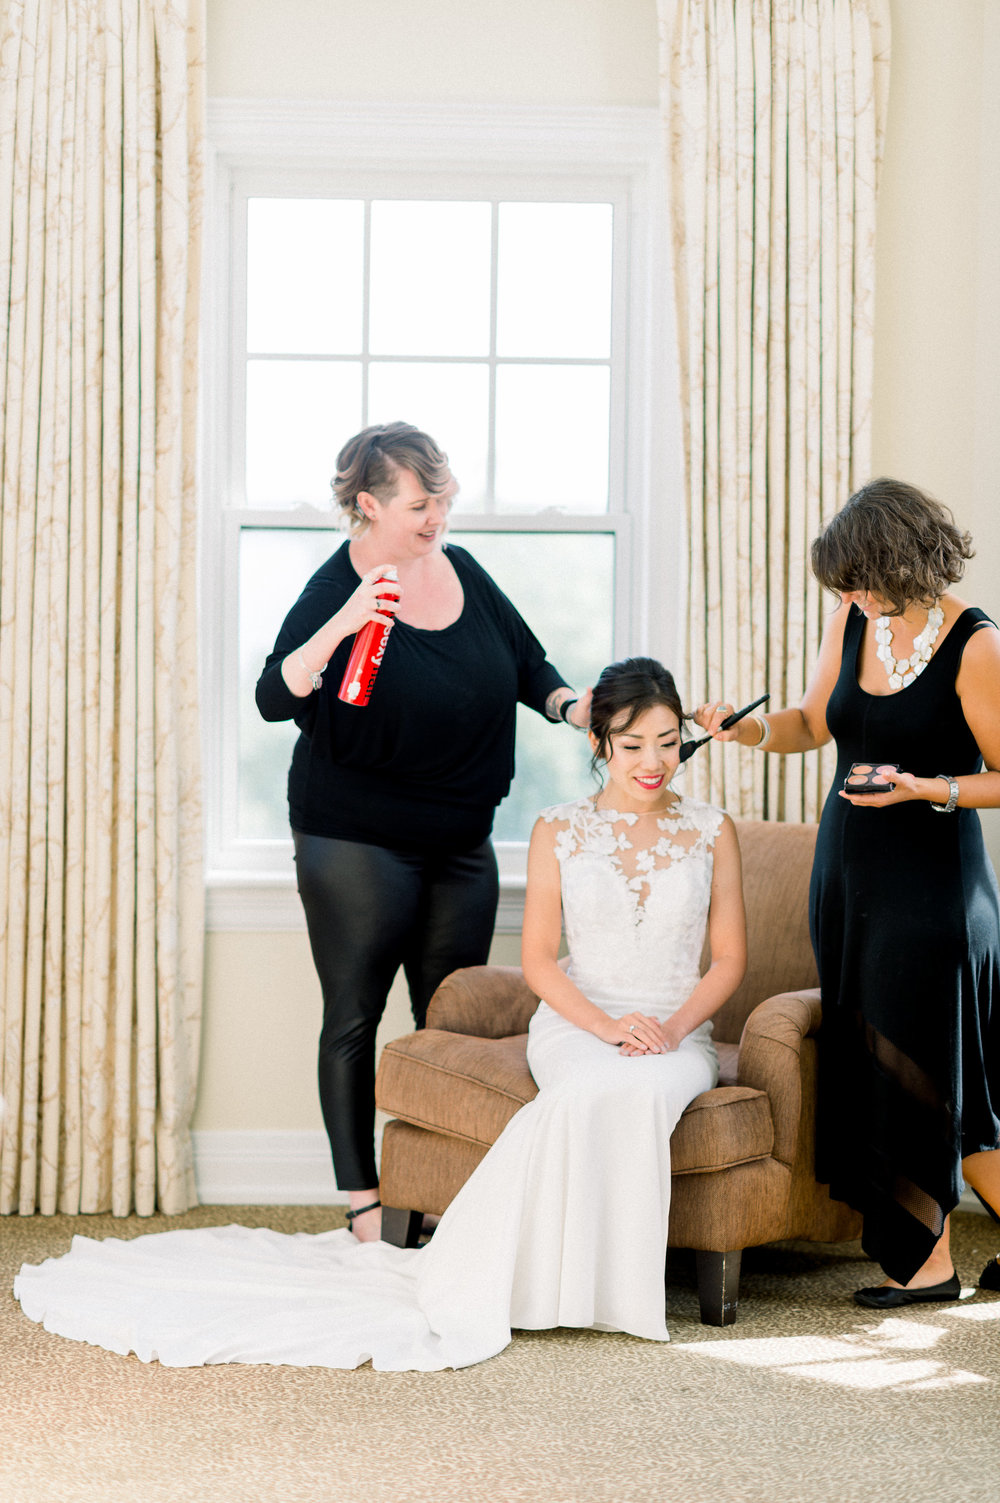 Mamiko-Aaron-Wedding-Whitney-Heard-Photography-5401.jpg